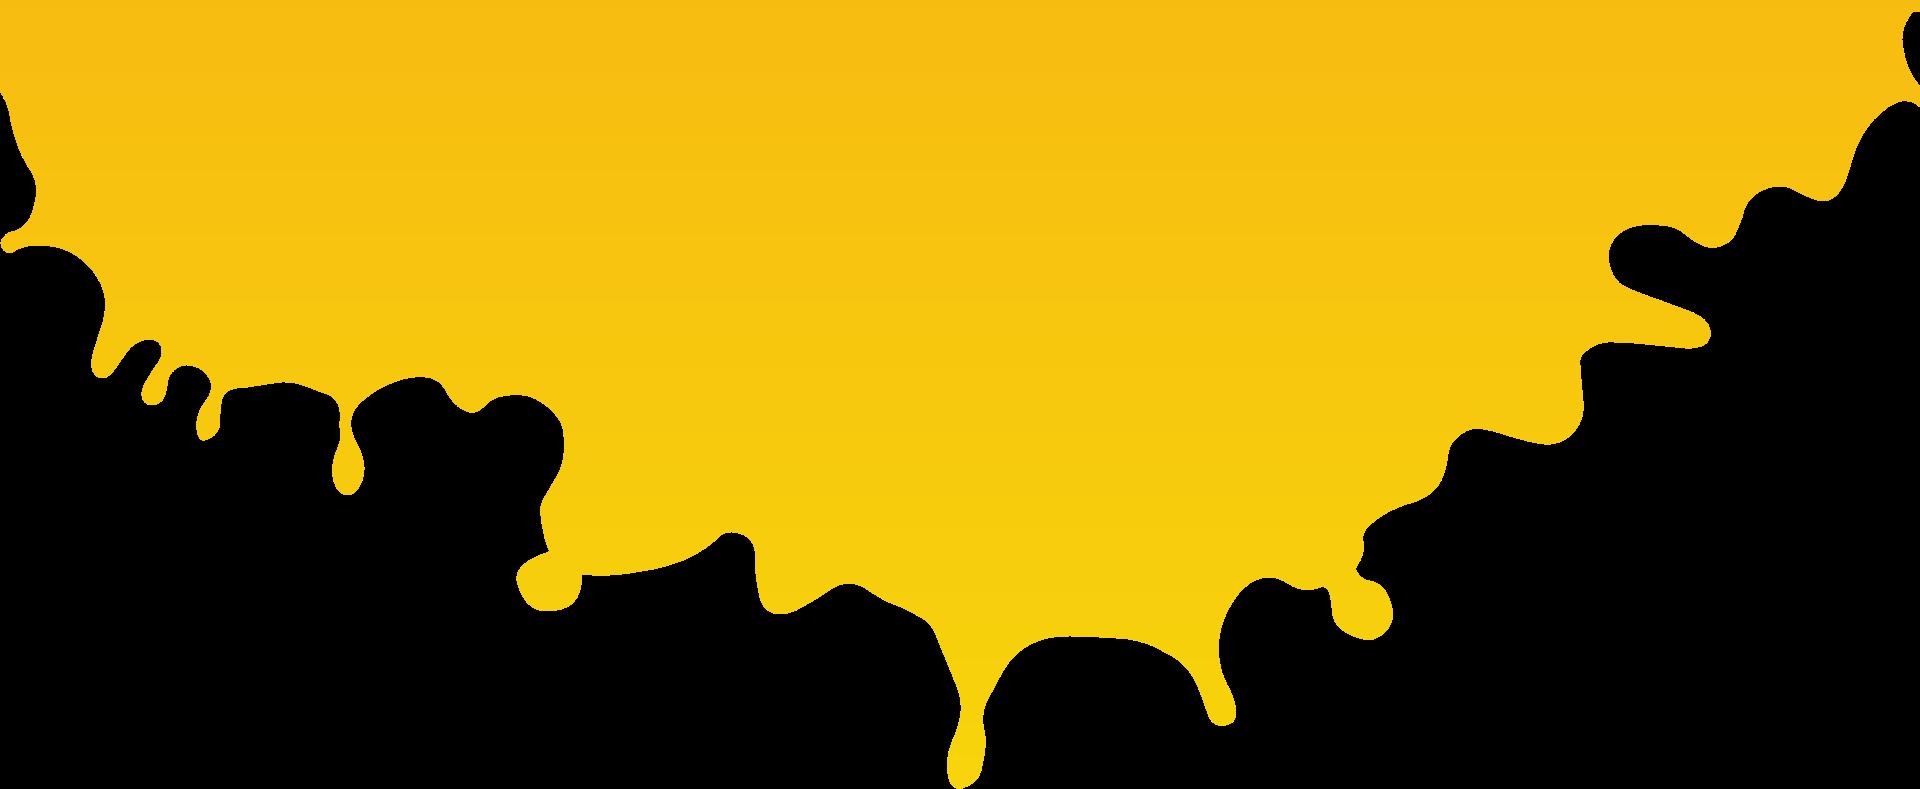 bg-residencia-footer